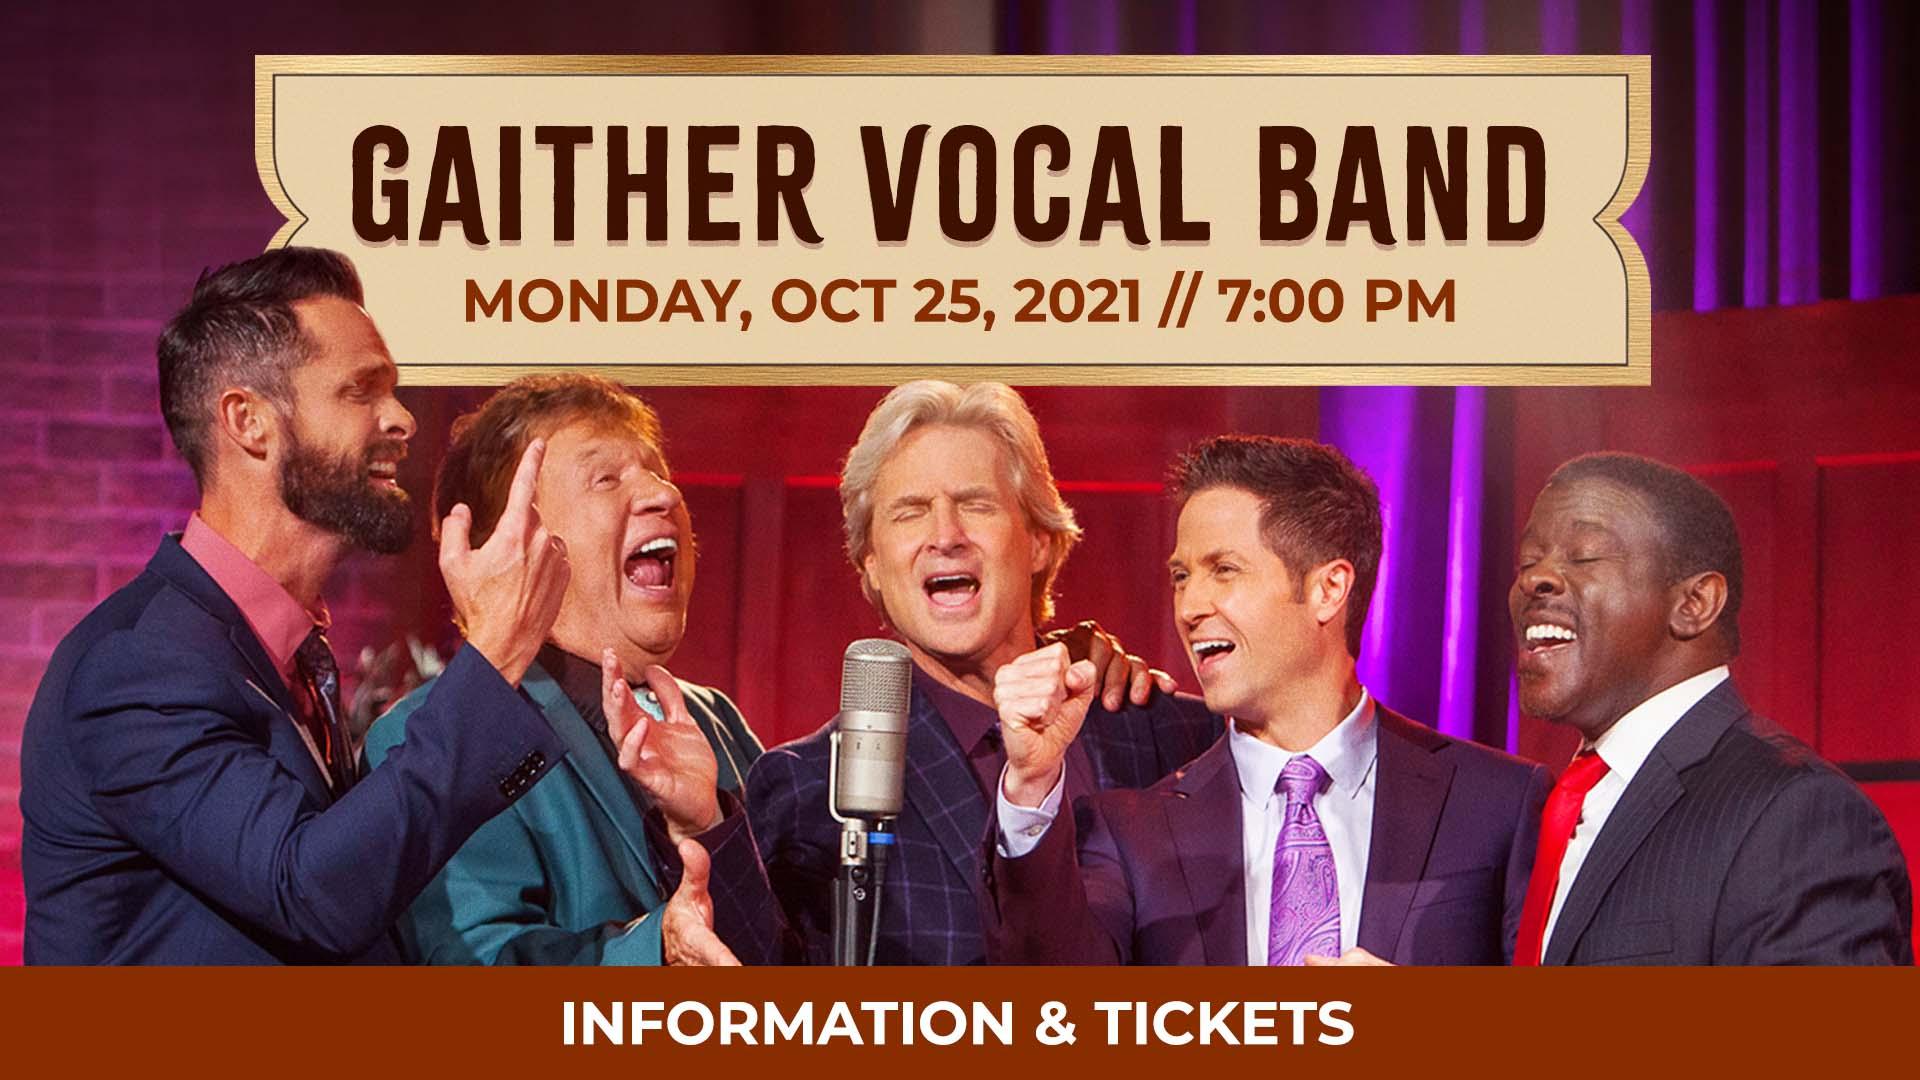 Gaither Vocal Band, Central Community Church, Wichita, KS